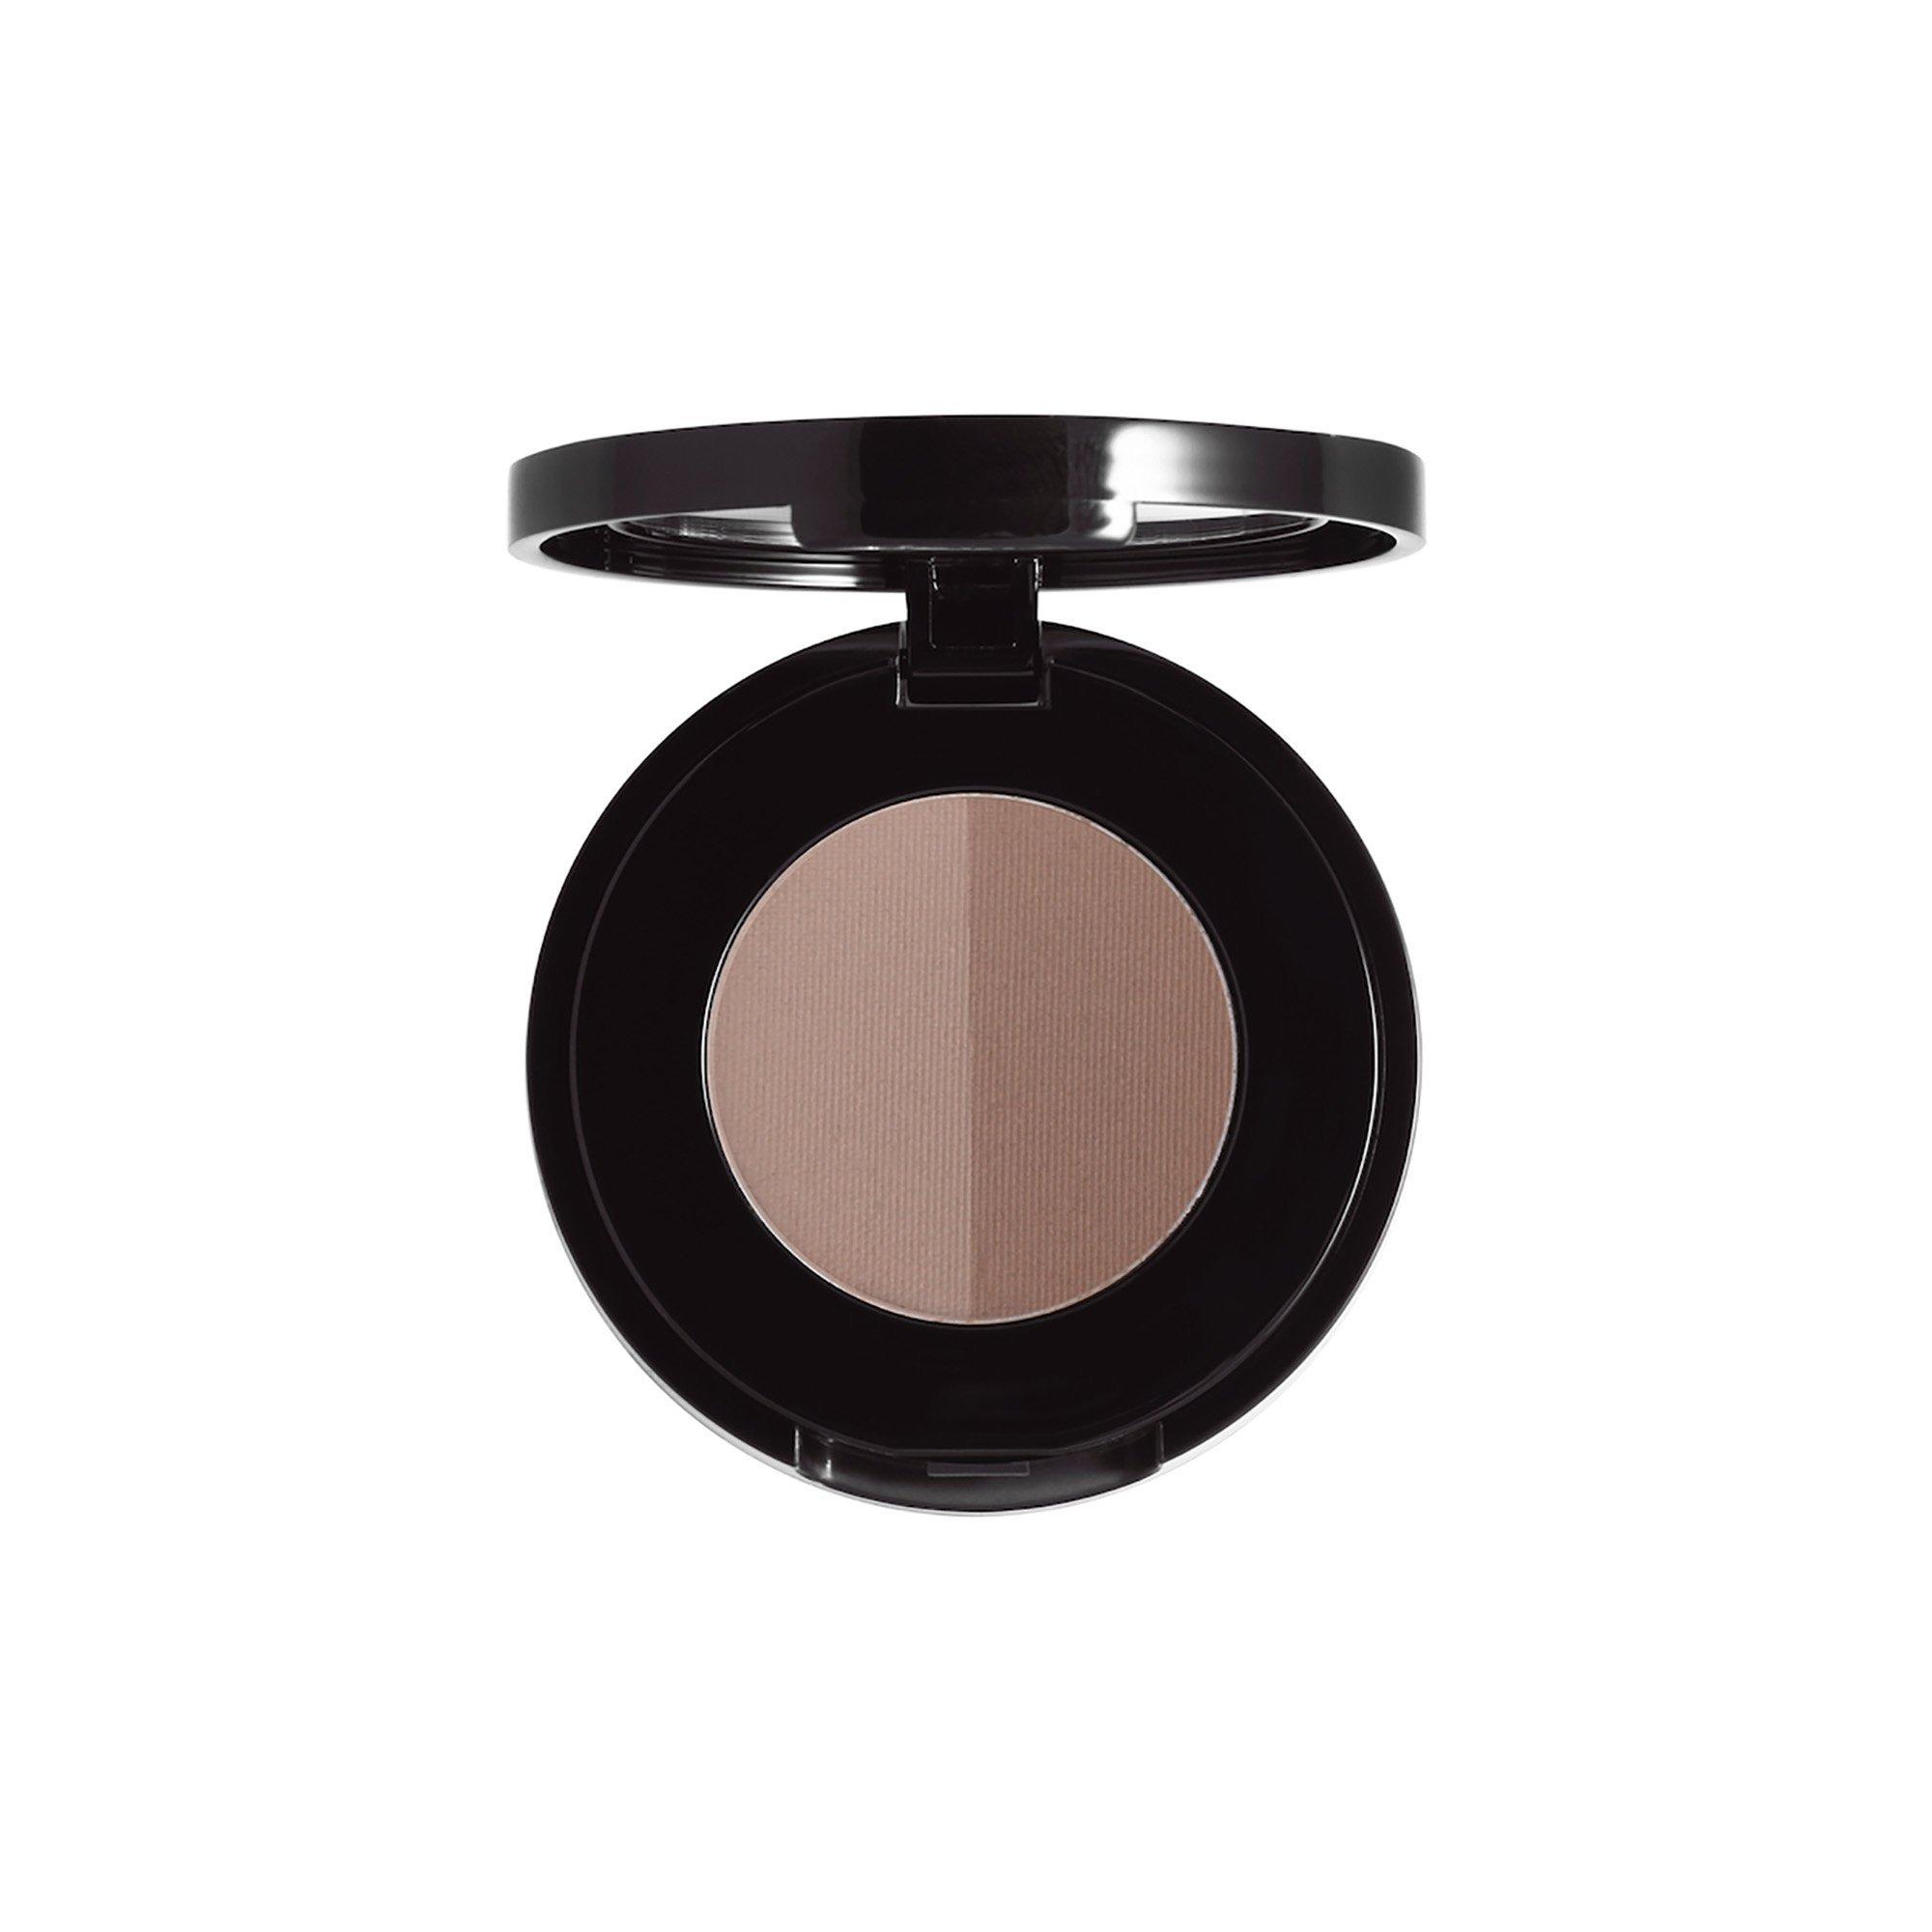 Anastasia Beverly Hills Brow Powder Duo Medium Brown Ql Cosmetic Eyebrow Cream 15 Gr Makeup Beauty